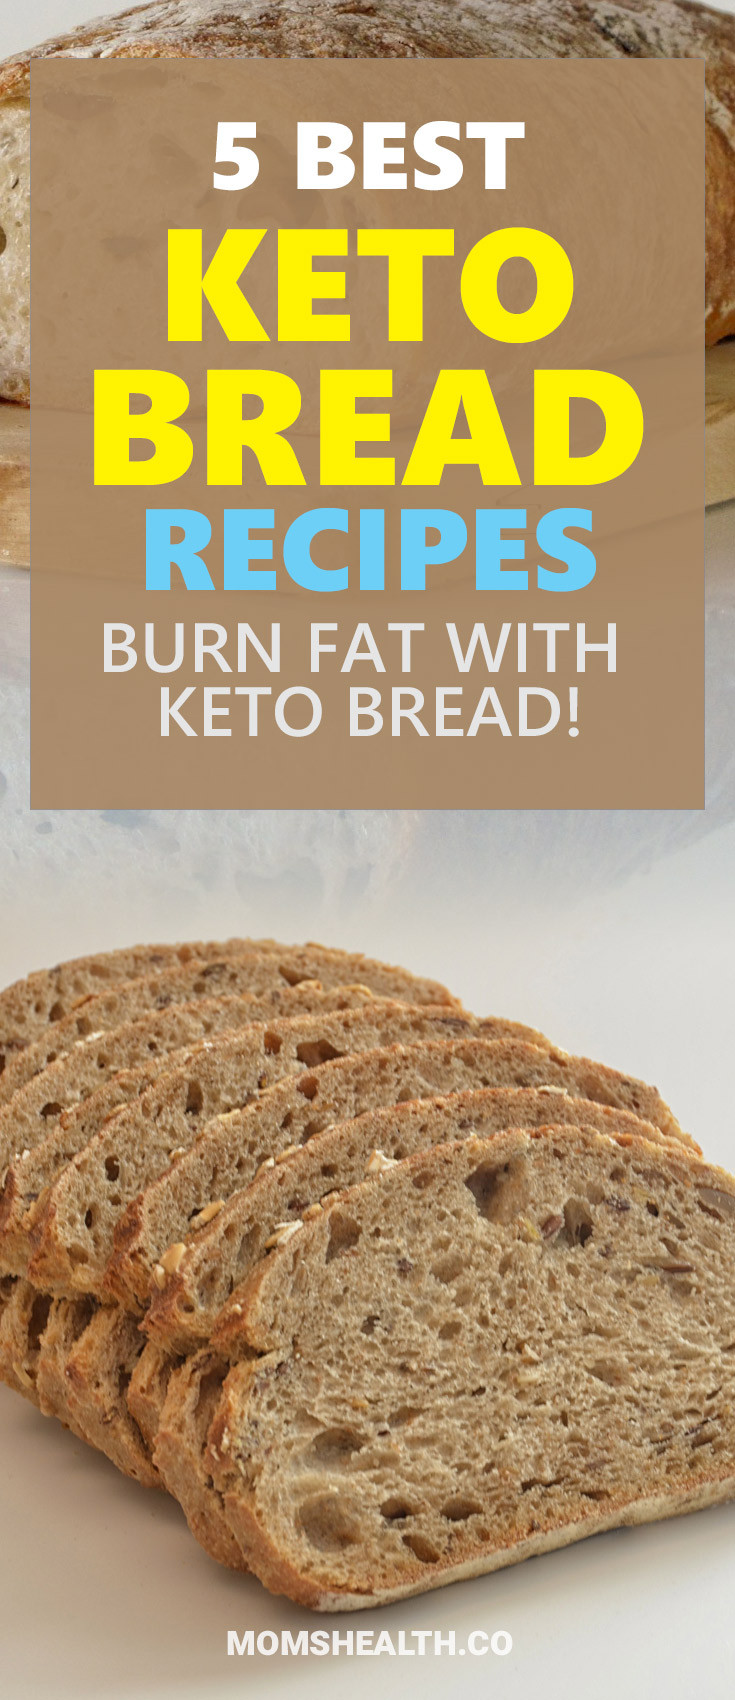 Keto Quick Bread  5 Best Keto Bread Recipes Easy and Quick Low Carb Bread